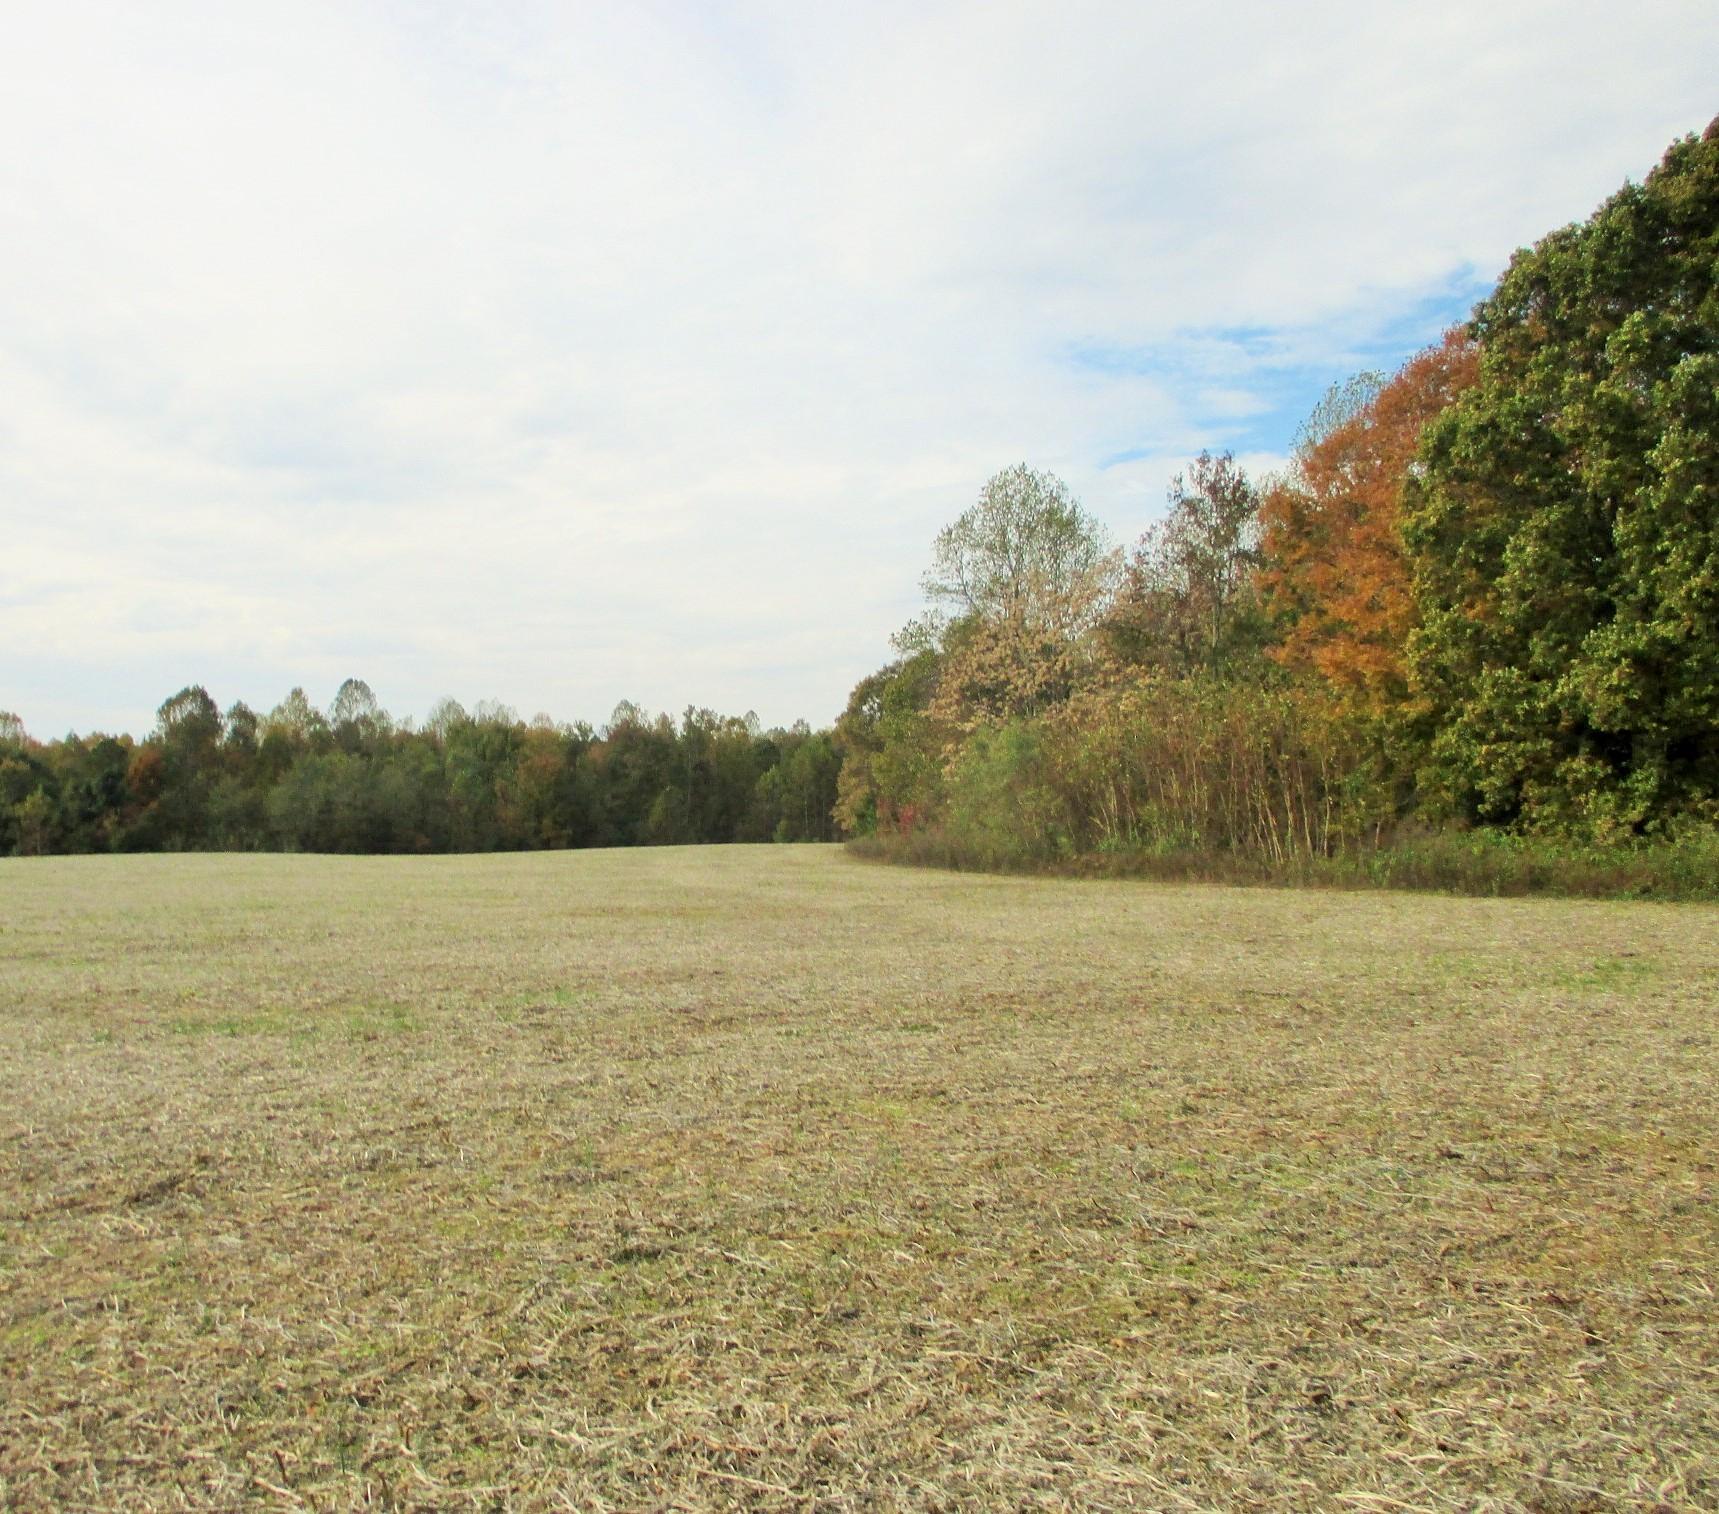 0 Paul Harrell Rd, Beechgrove, TN 37018 - Beechgrove, TN real estate listing